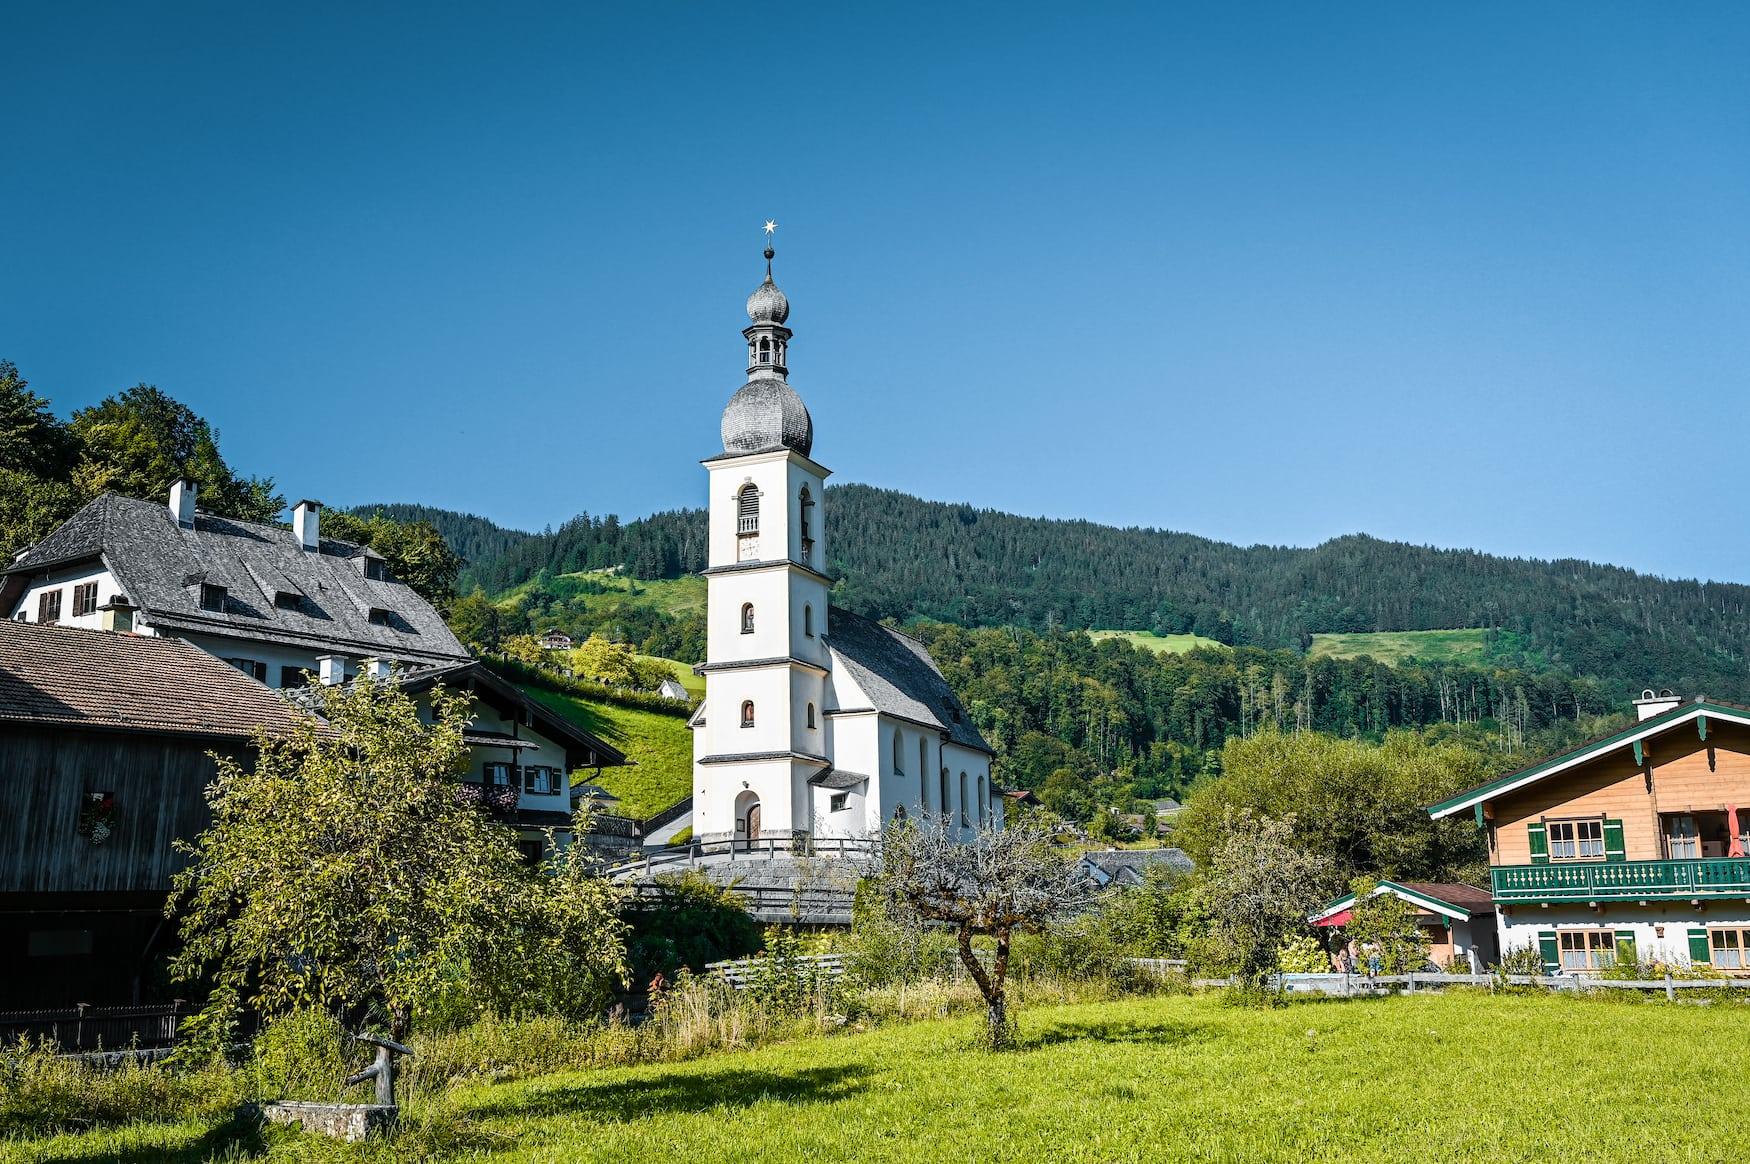 Pfarrkirche St. Sebastian im Dorf Ramsau in Bayern